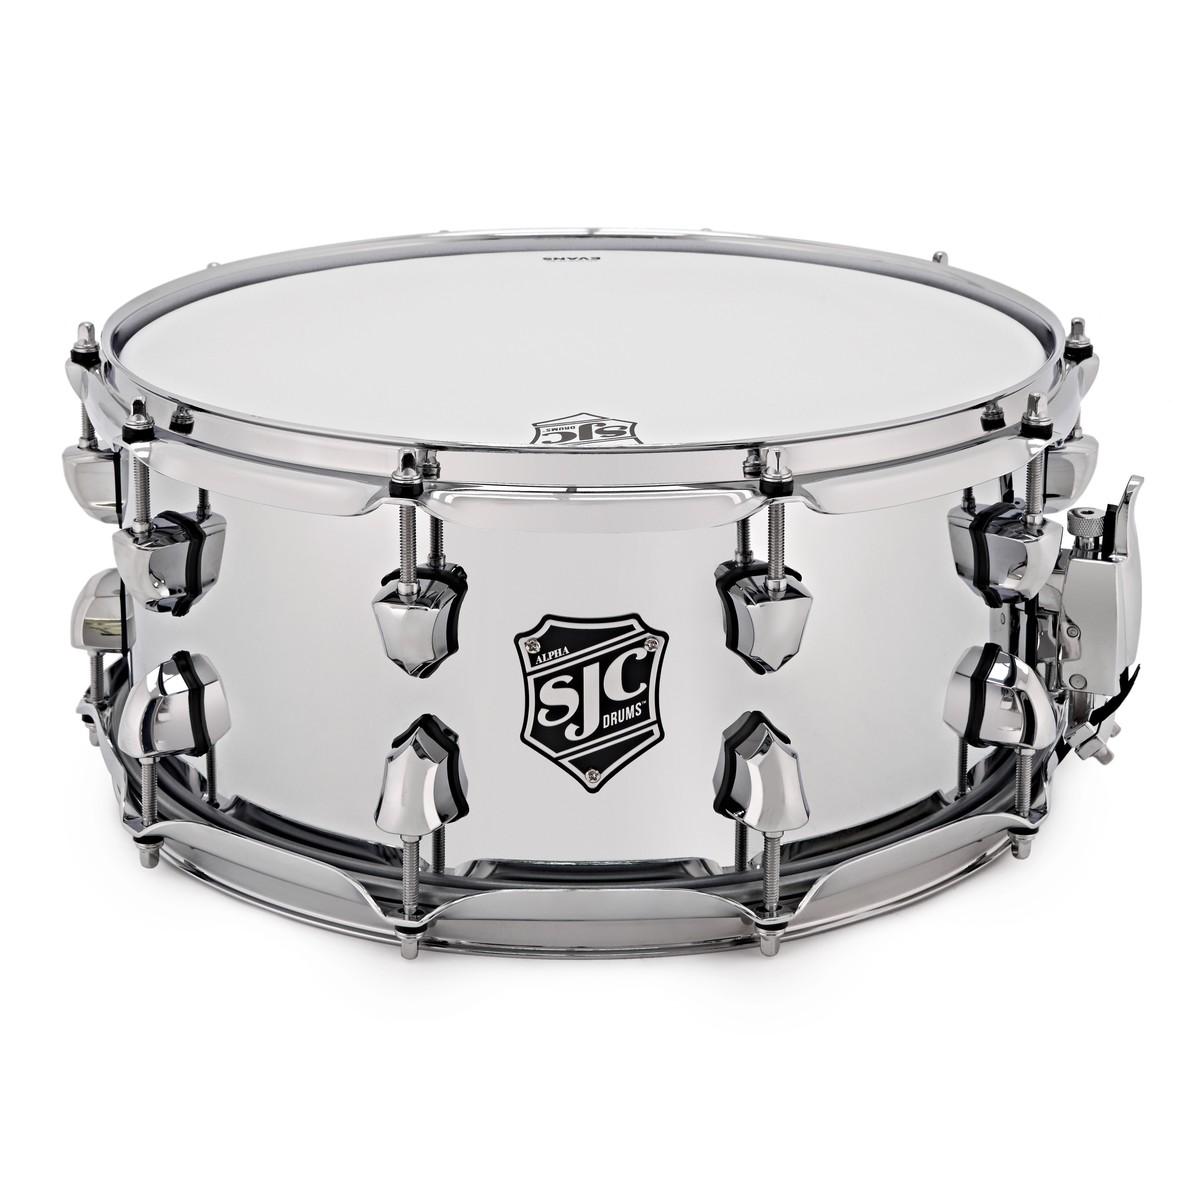 SJC Drums Alpha 14\'\' x 6.5\'\' Snare Drum, Chrome over Rolled Steel at ...